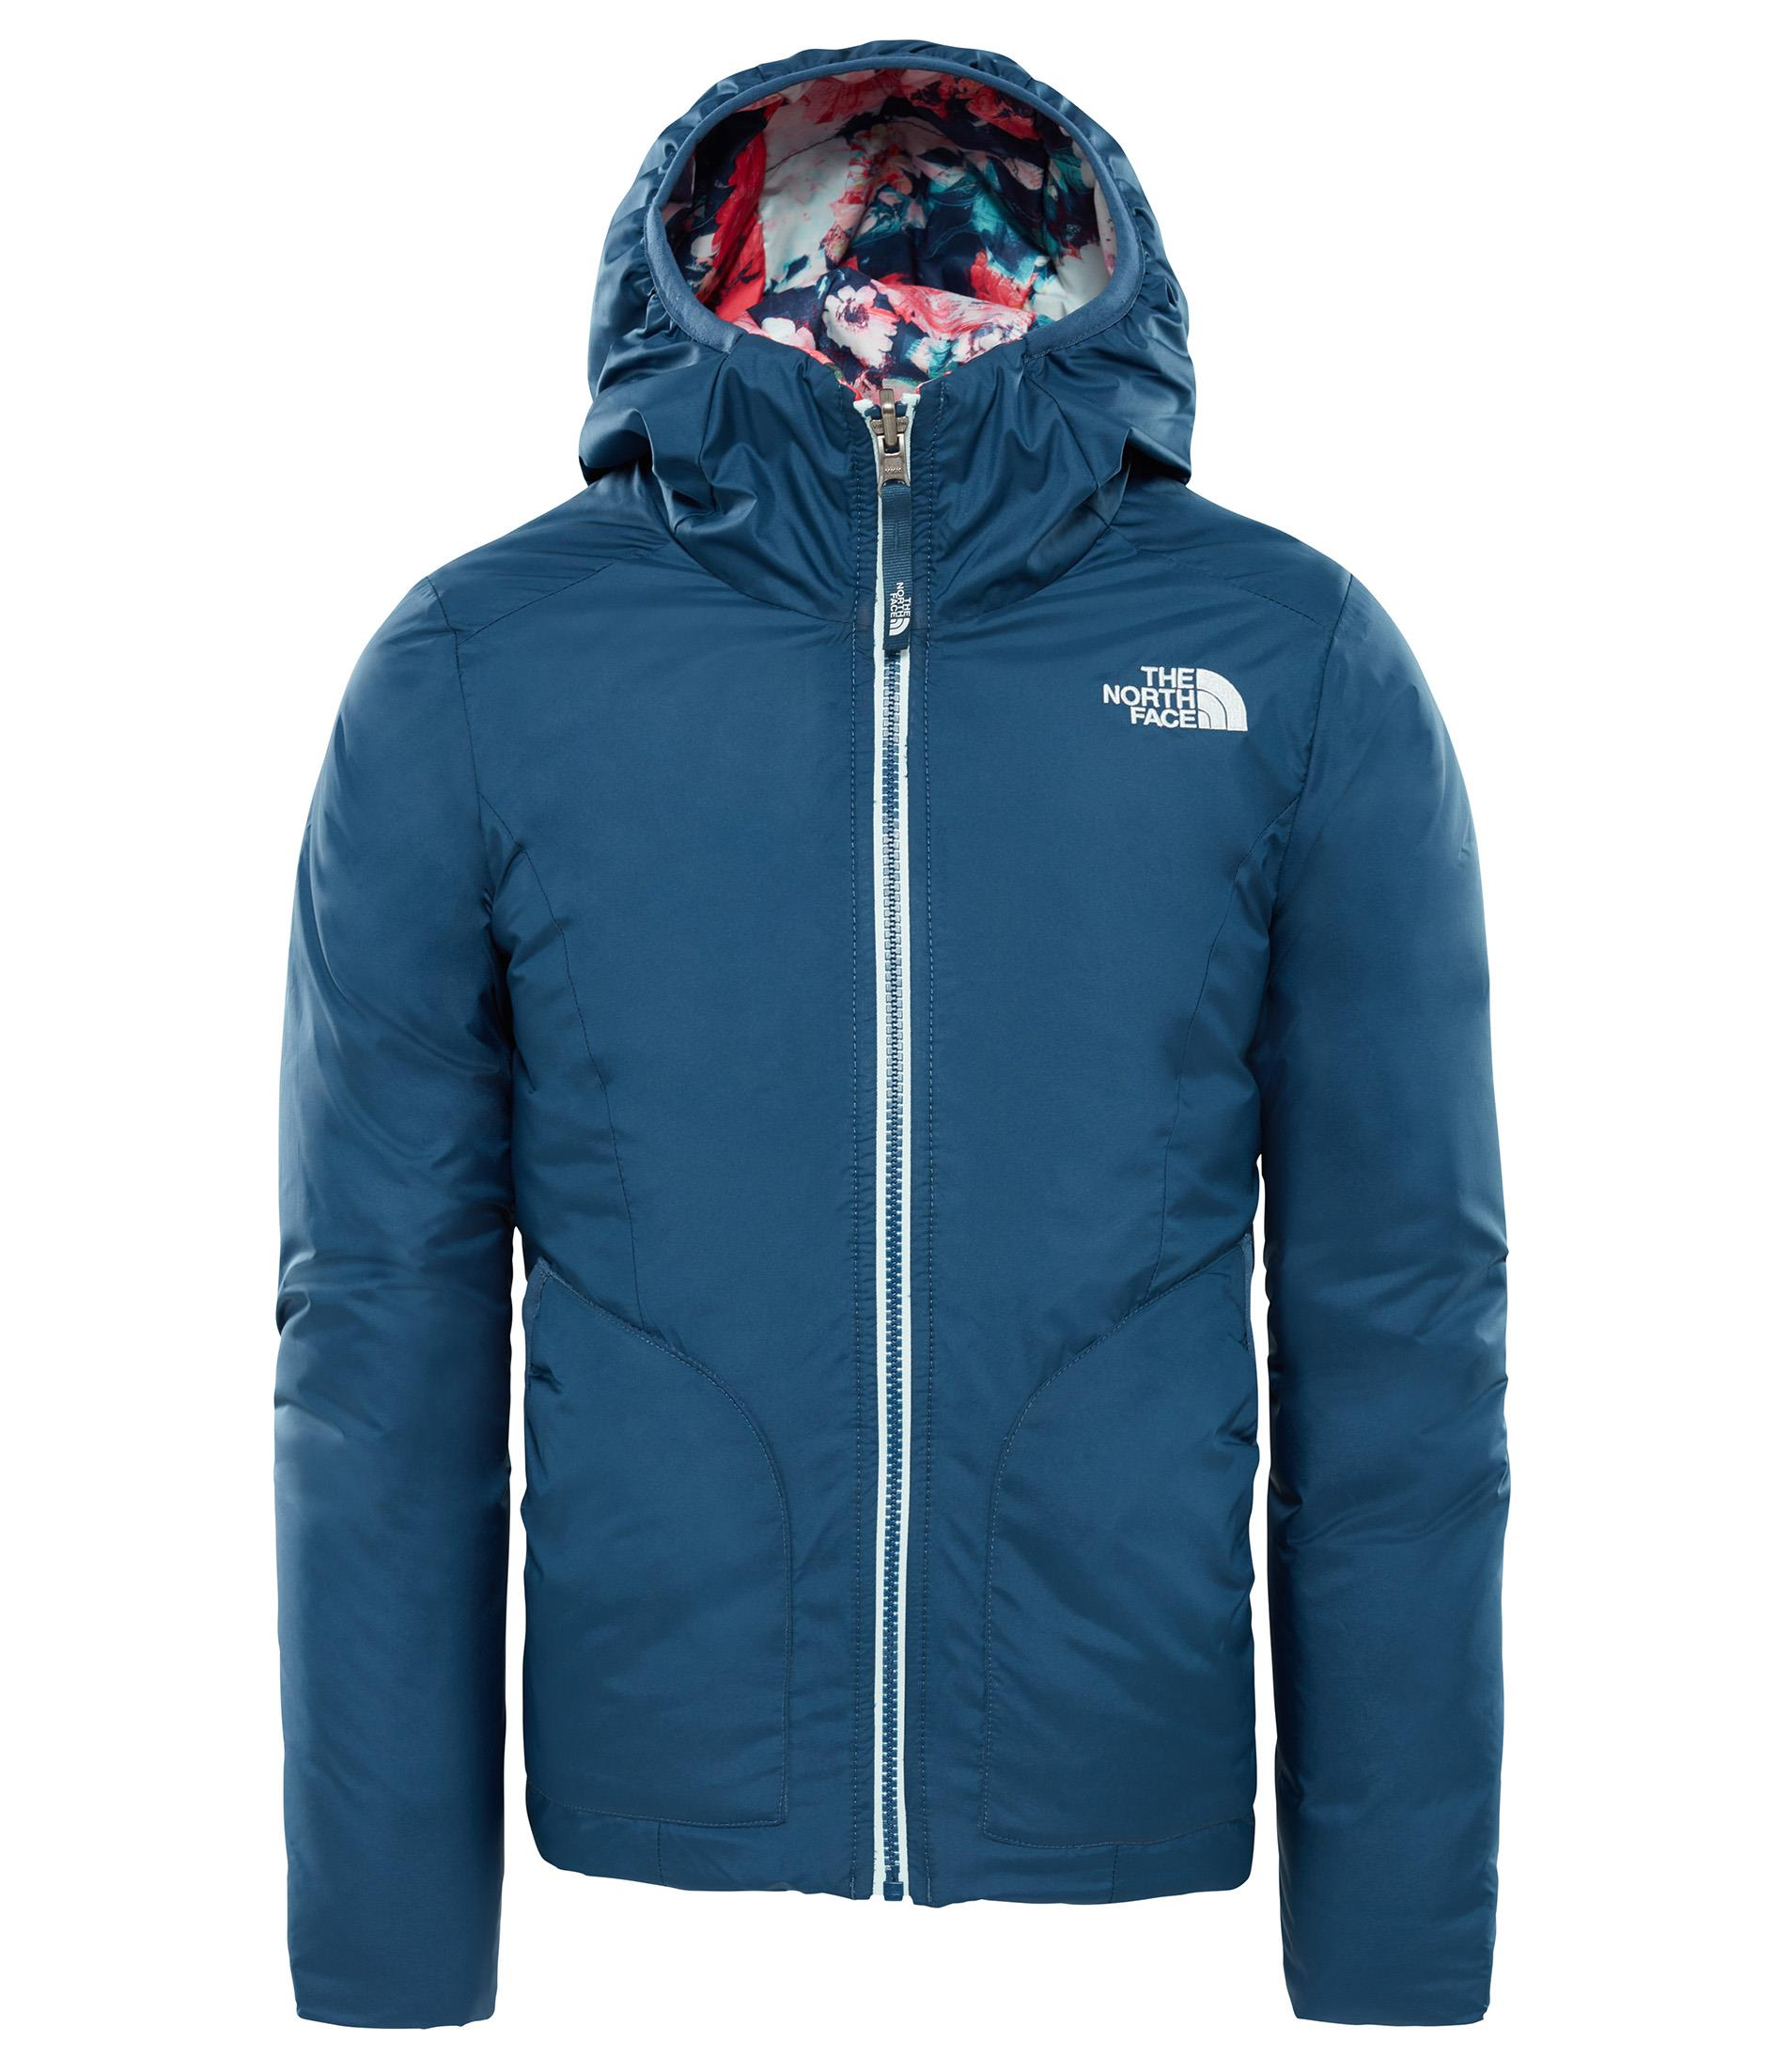 The North Face Çift Taraflı Giyilen Perrito Çocuk Ceket T93CVQN4L